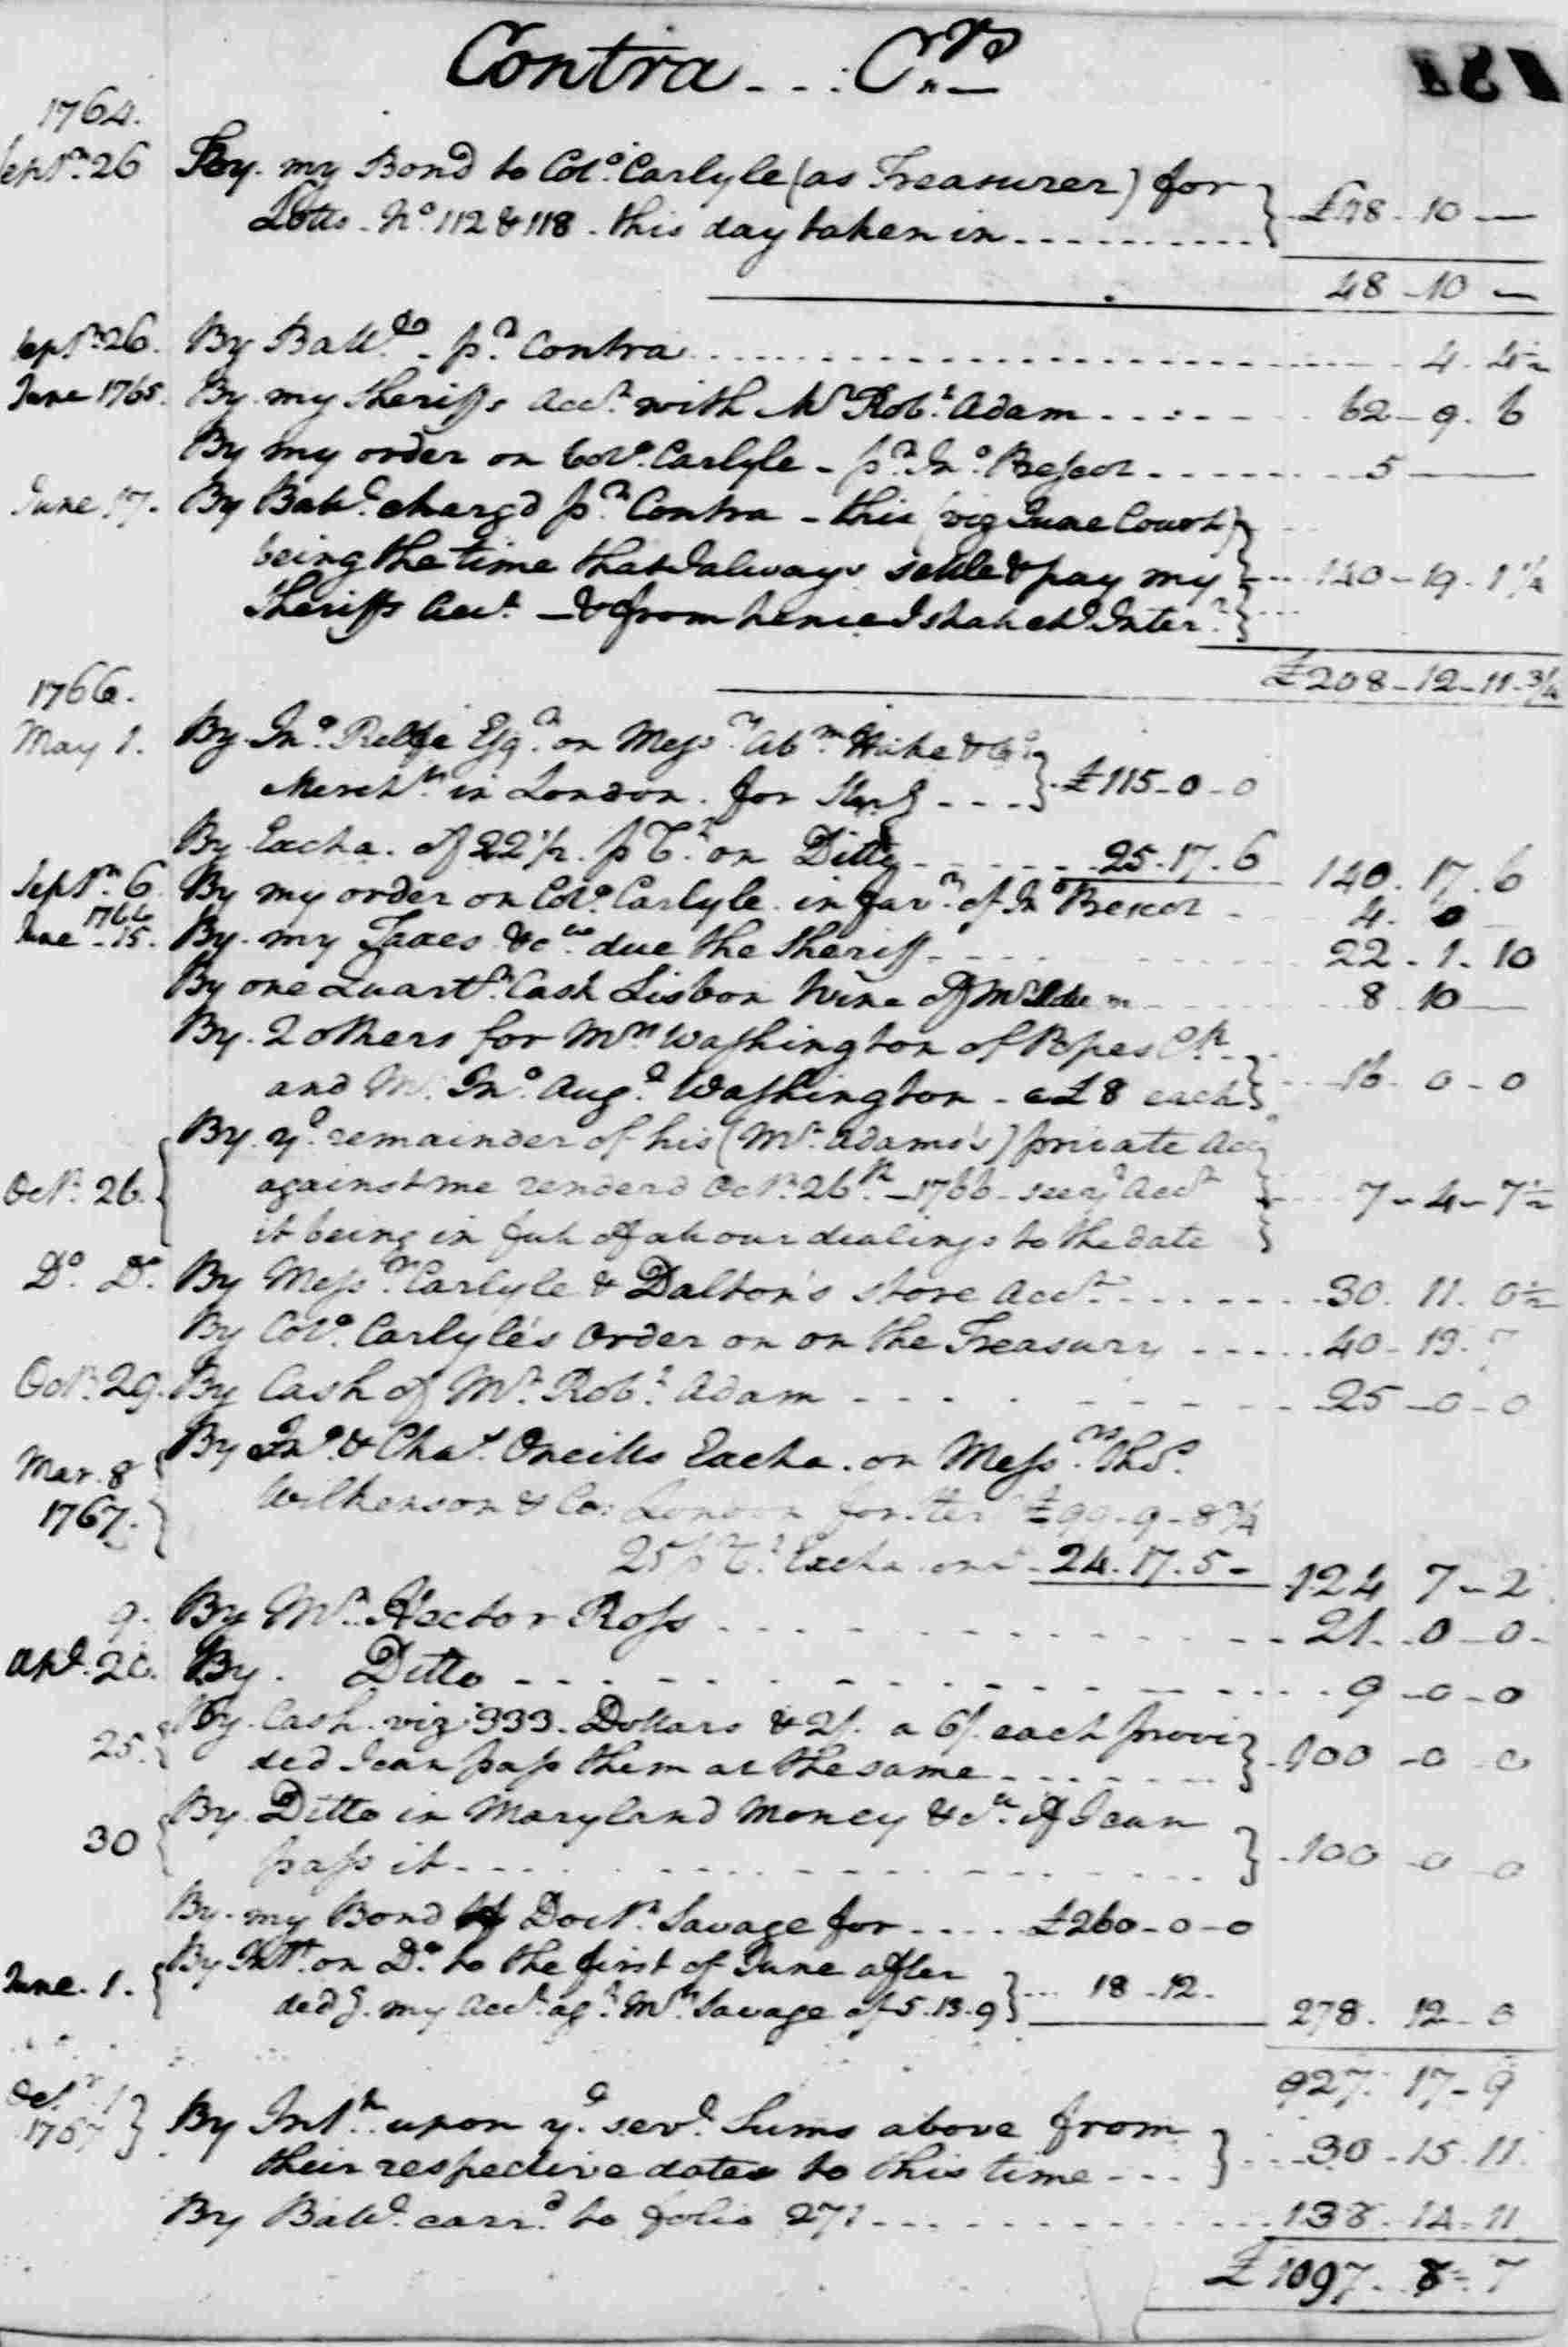 Ledger A, folio 180, right side